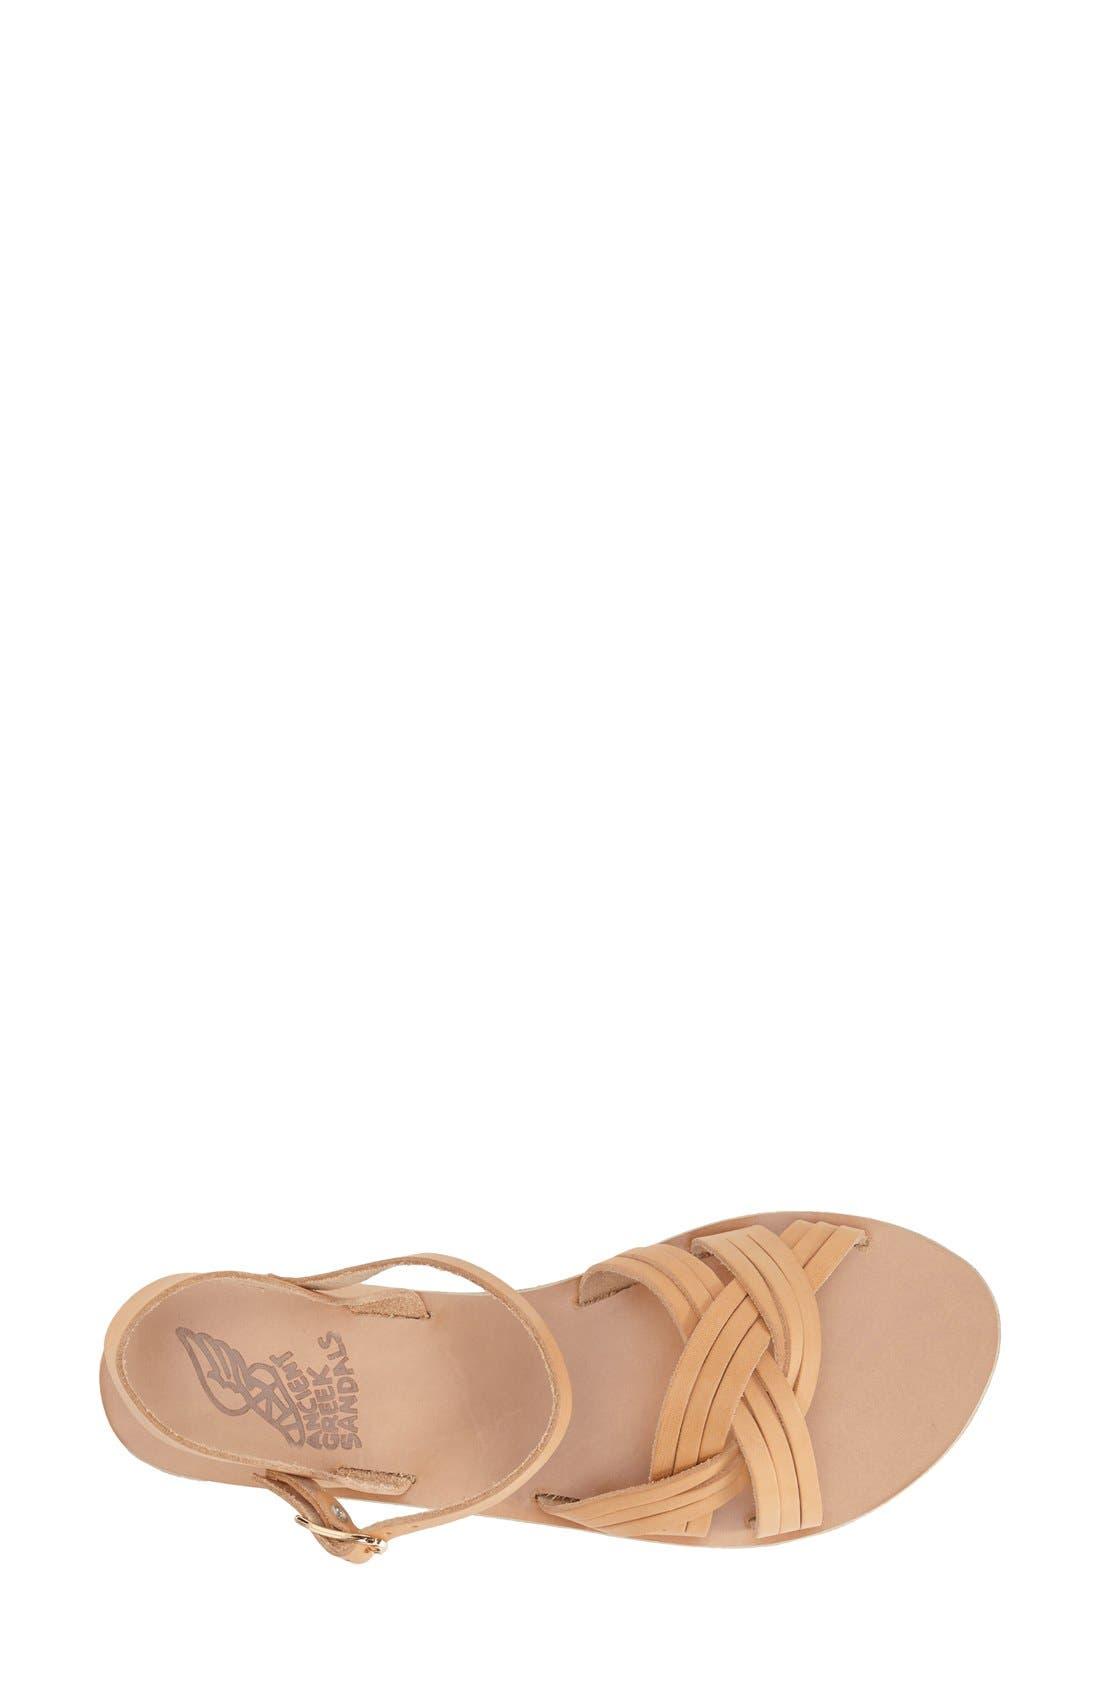 Alternate Image 3  - Ancient Greek Sandals 'Electra' Quarter Strap Sandal (Women)